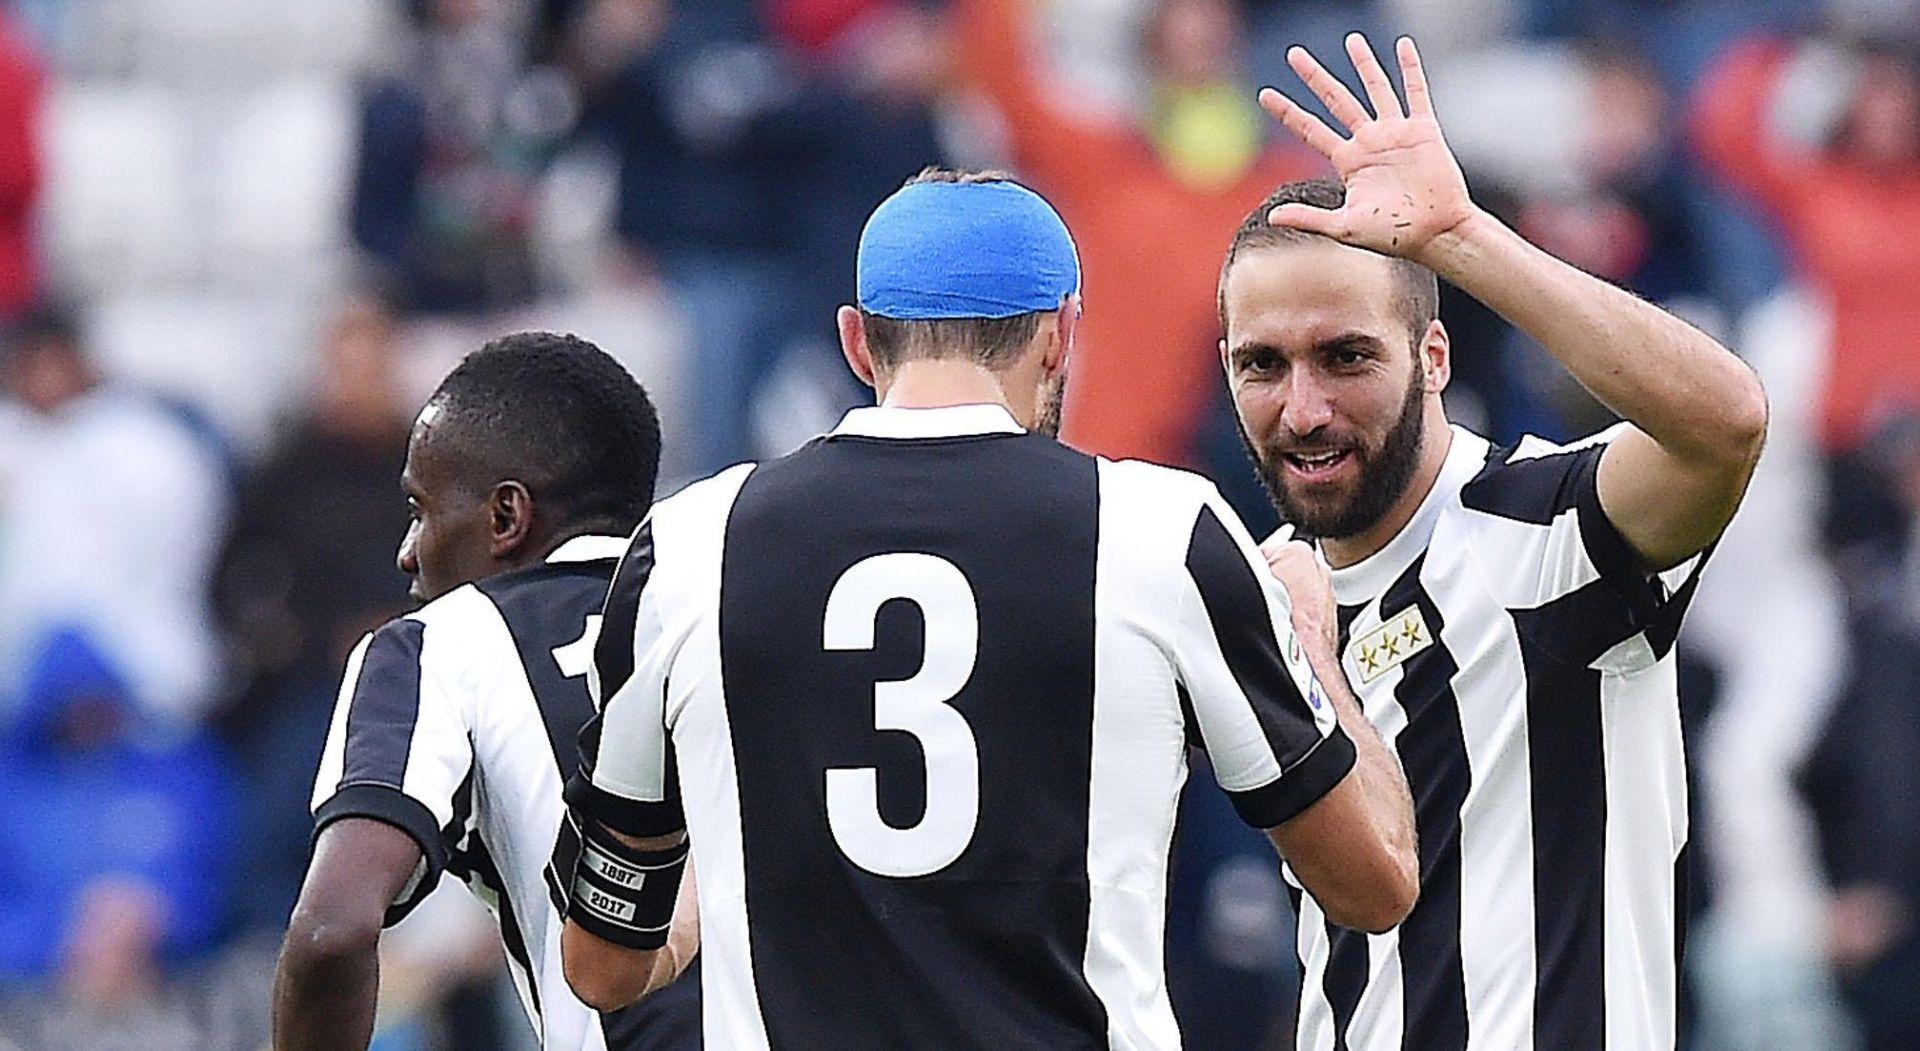 SERIE A Pobjede Juventusa i Rome, remiji Intera i Napolija